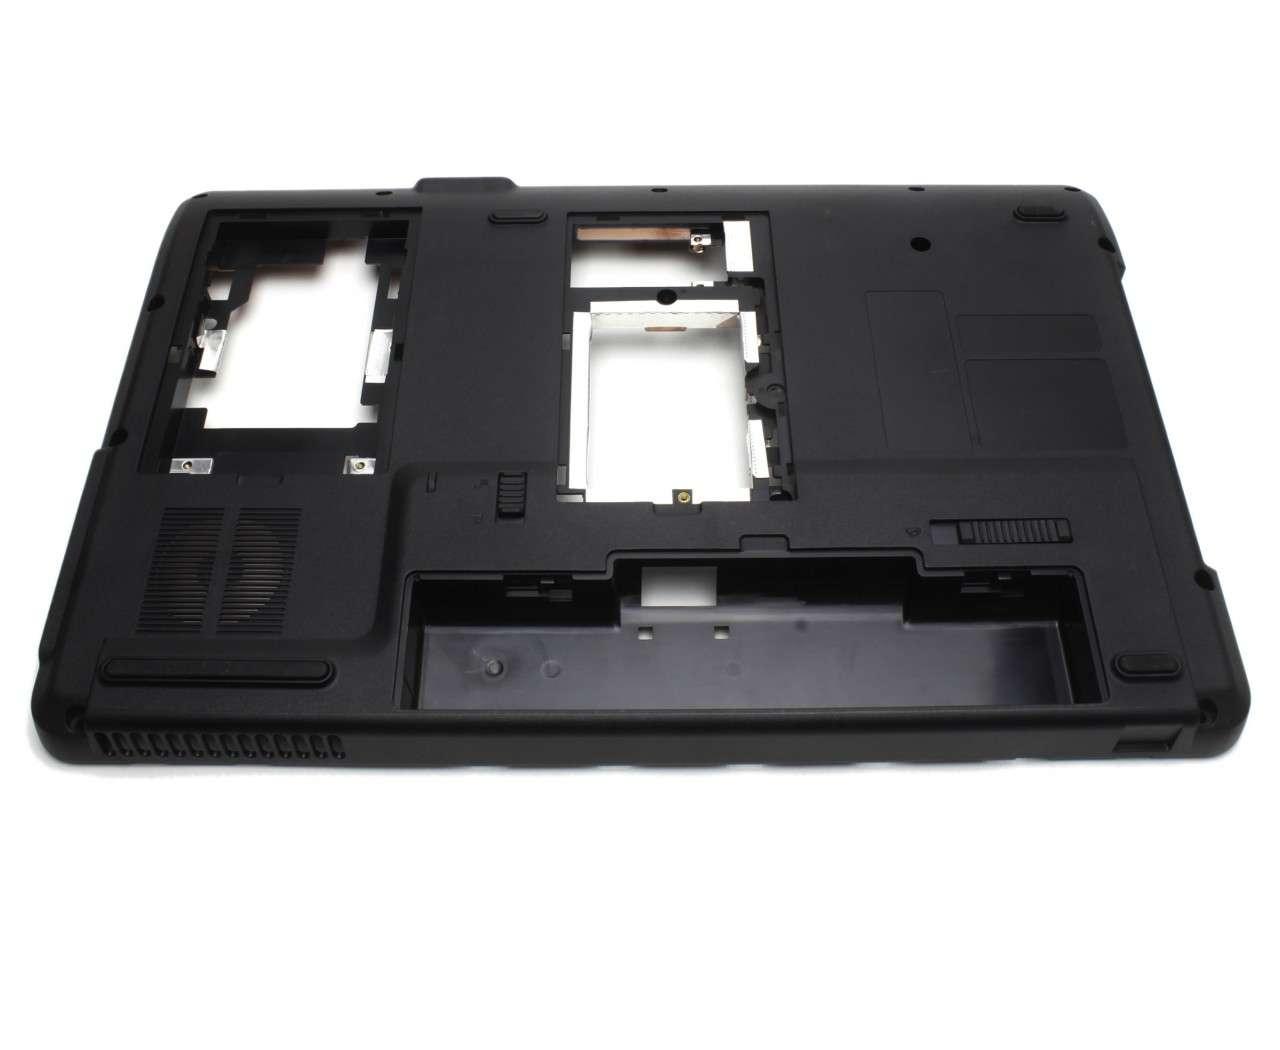 Bottom Case Emachines E525 Carcasa Inferioara Neagra imagine powerlaptop.ro 2021